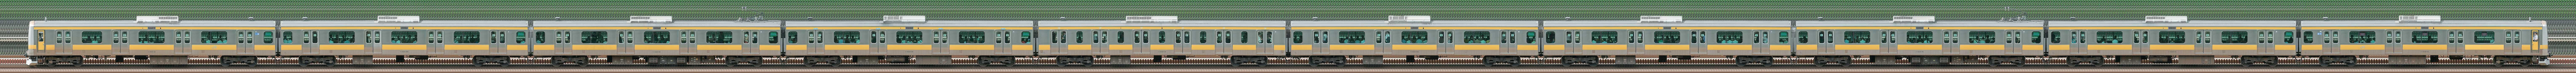 JR東日本 中央・総武緩行線 E231系B35編成(機器更新車・山側)の編成サイドビュー